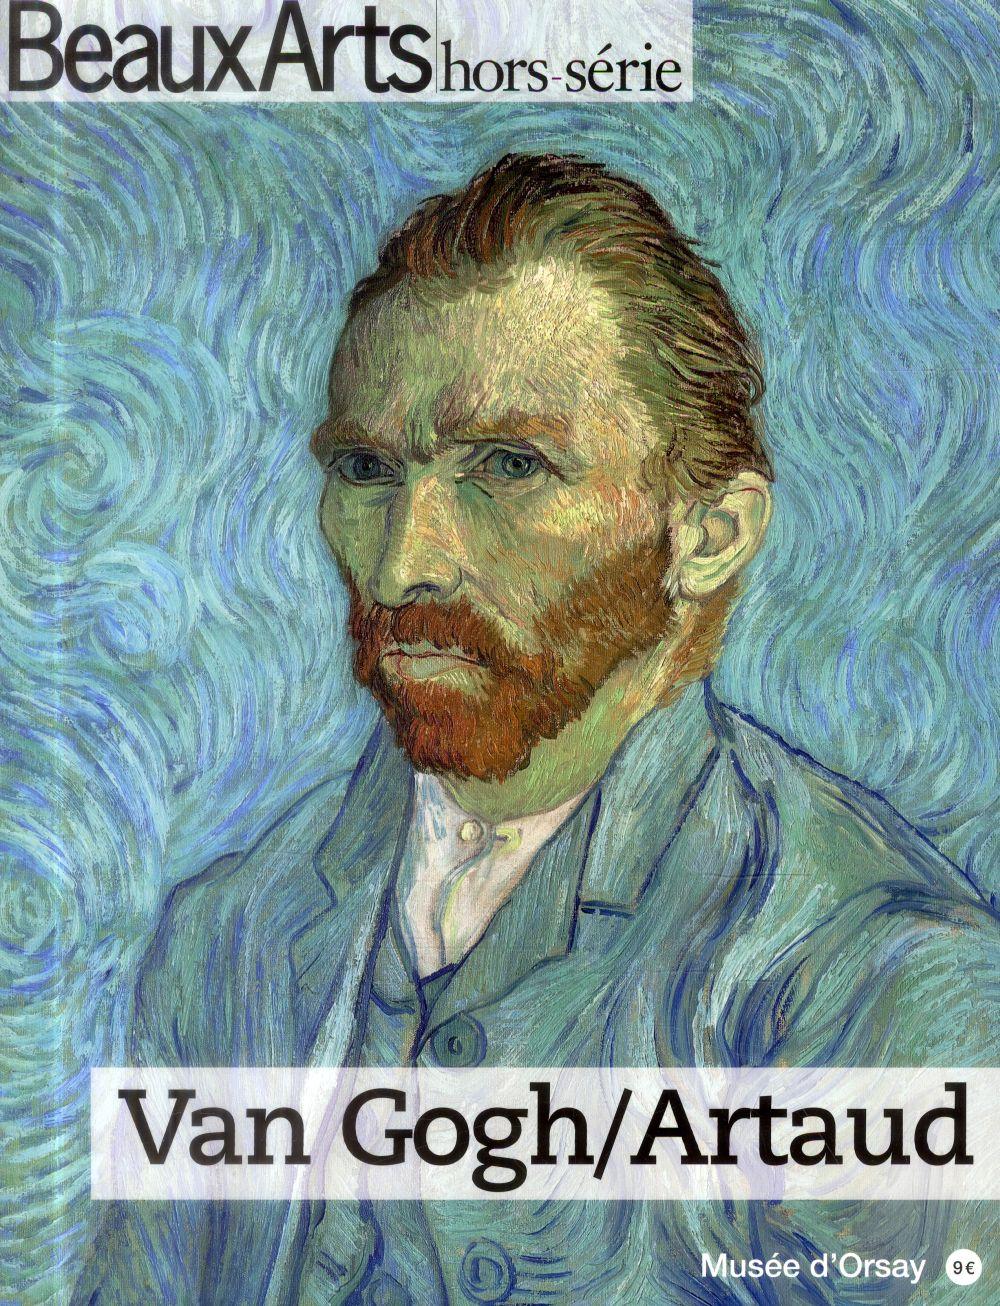 VAN GOGH / ARTAUD AU MUSEE D ORSAY